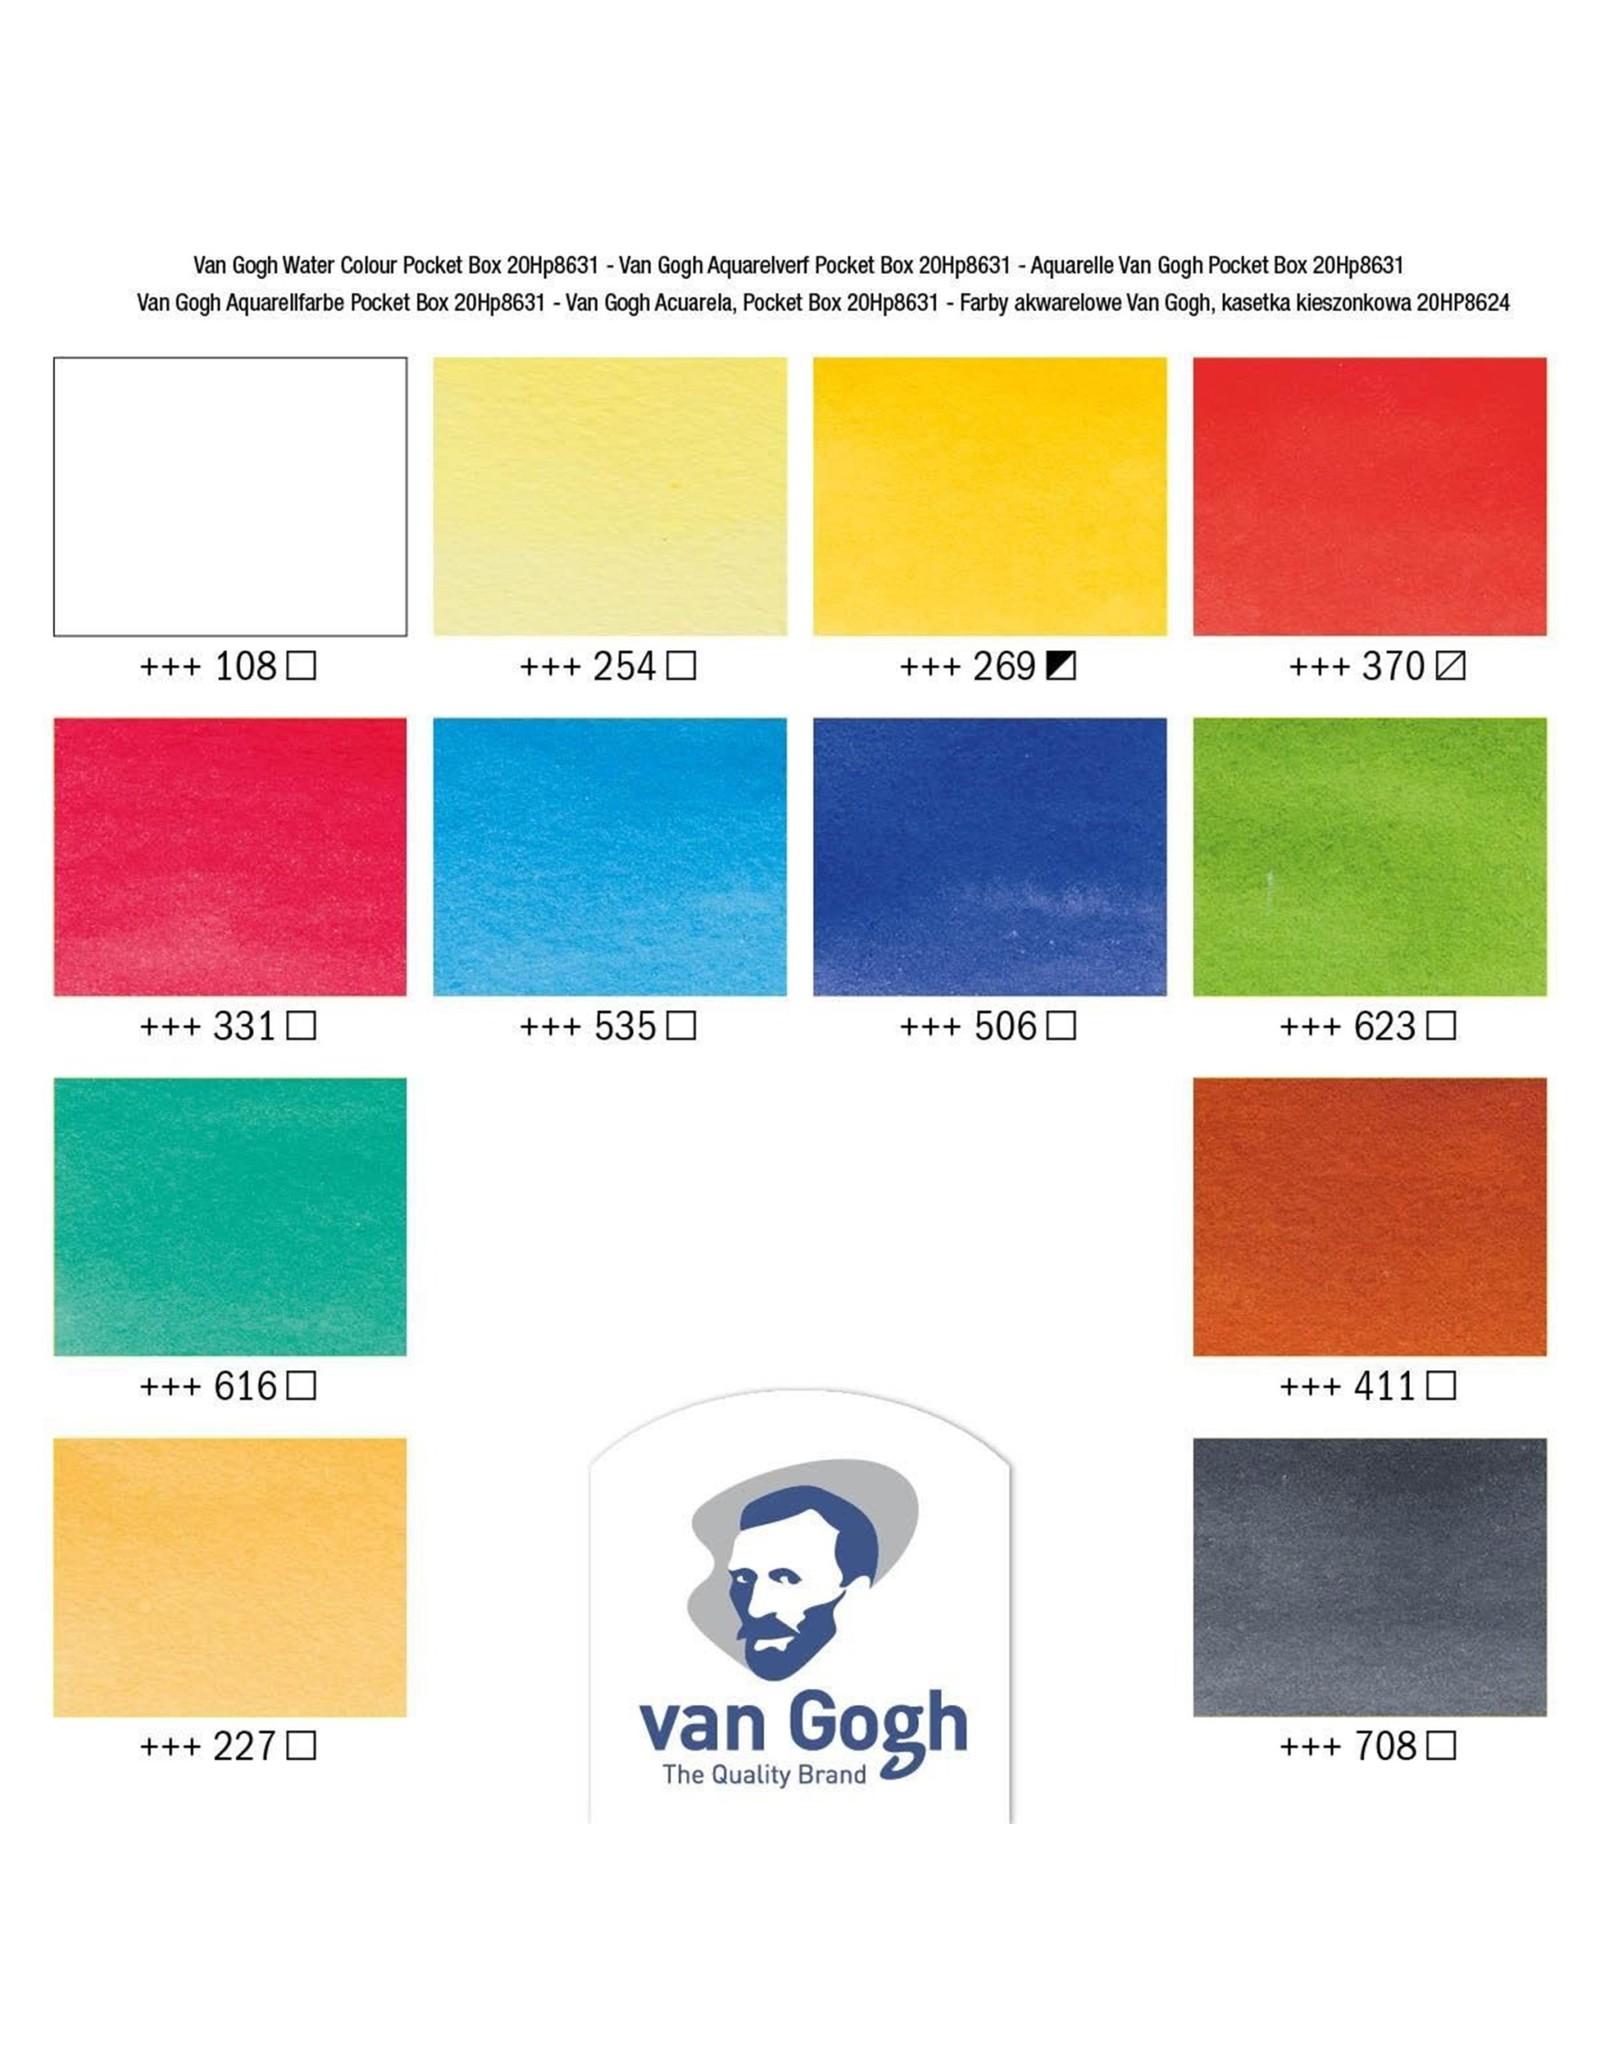 Van Gogh Aquaerlverf Pocket Box 12 napjes